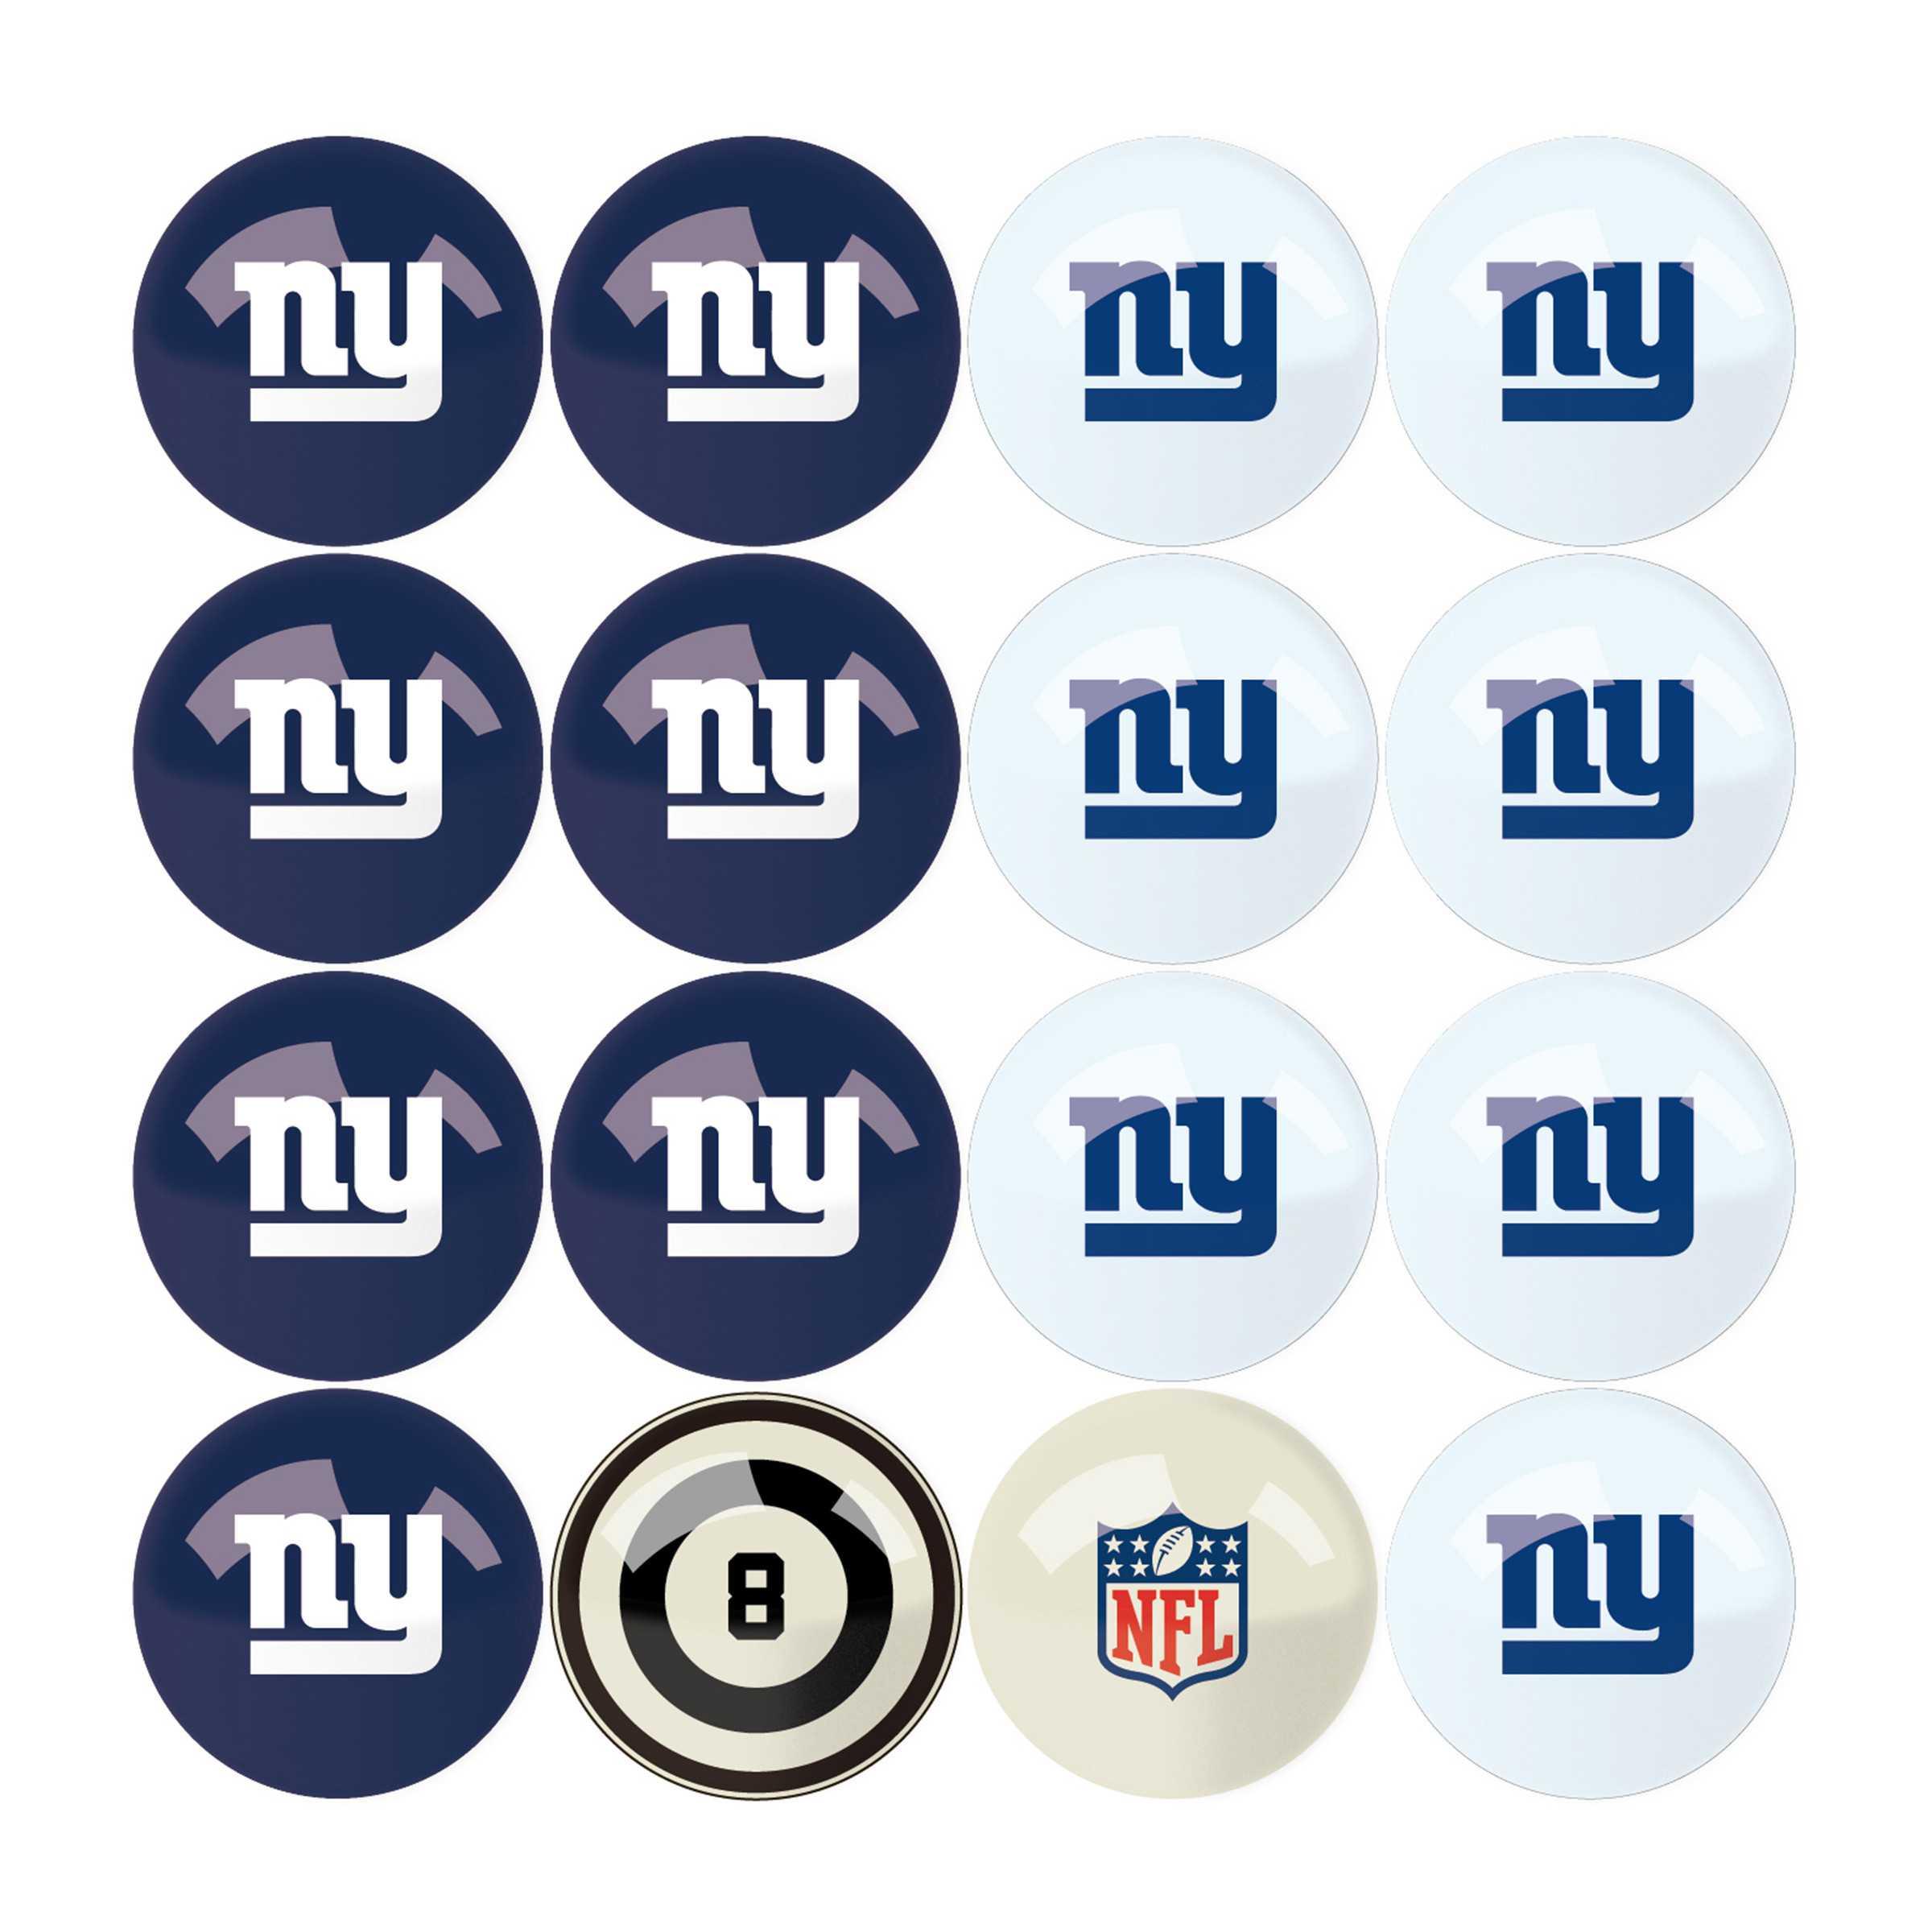 New York Giants Billiard Balls with Numbers